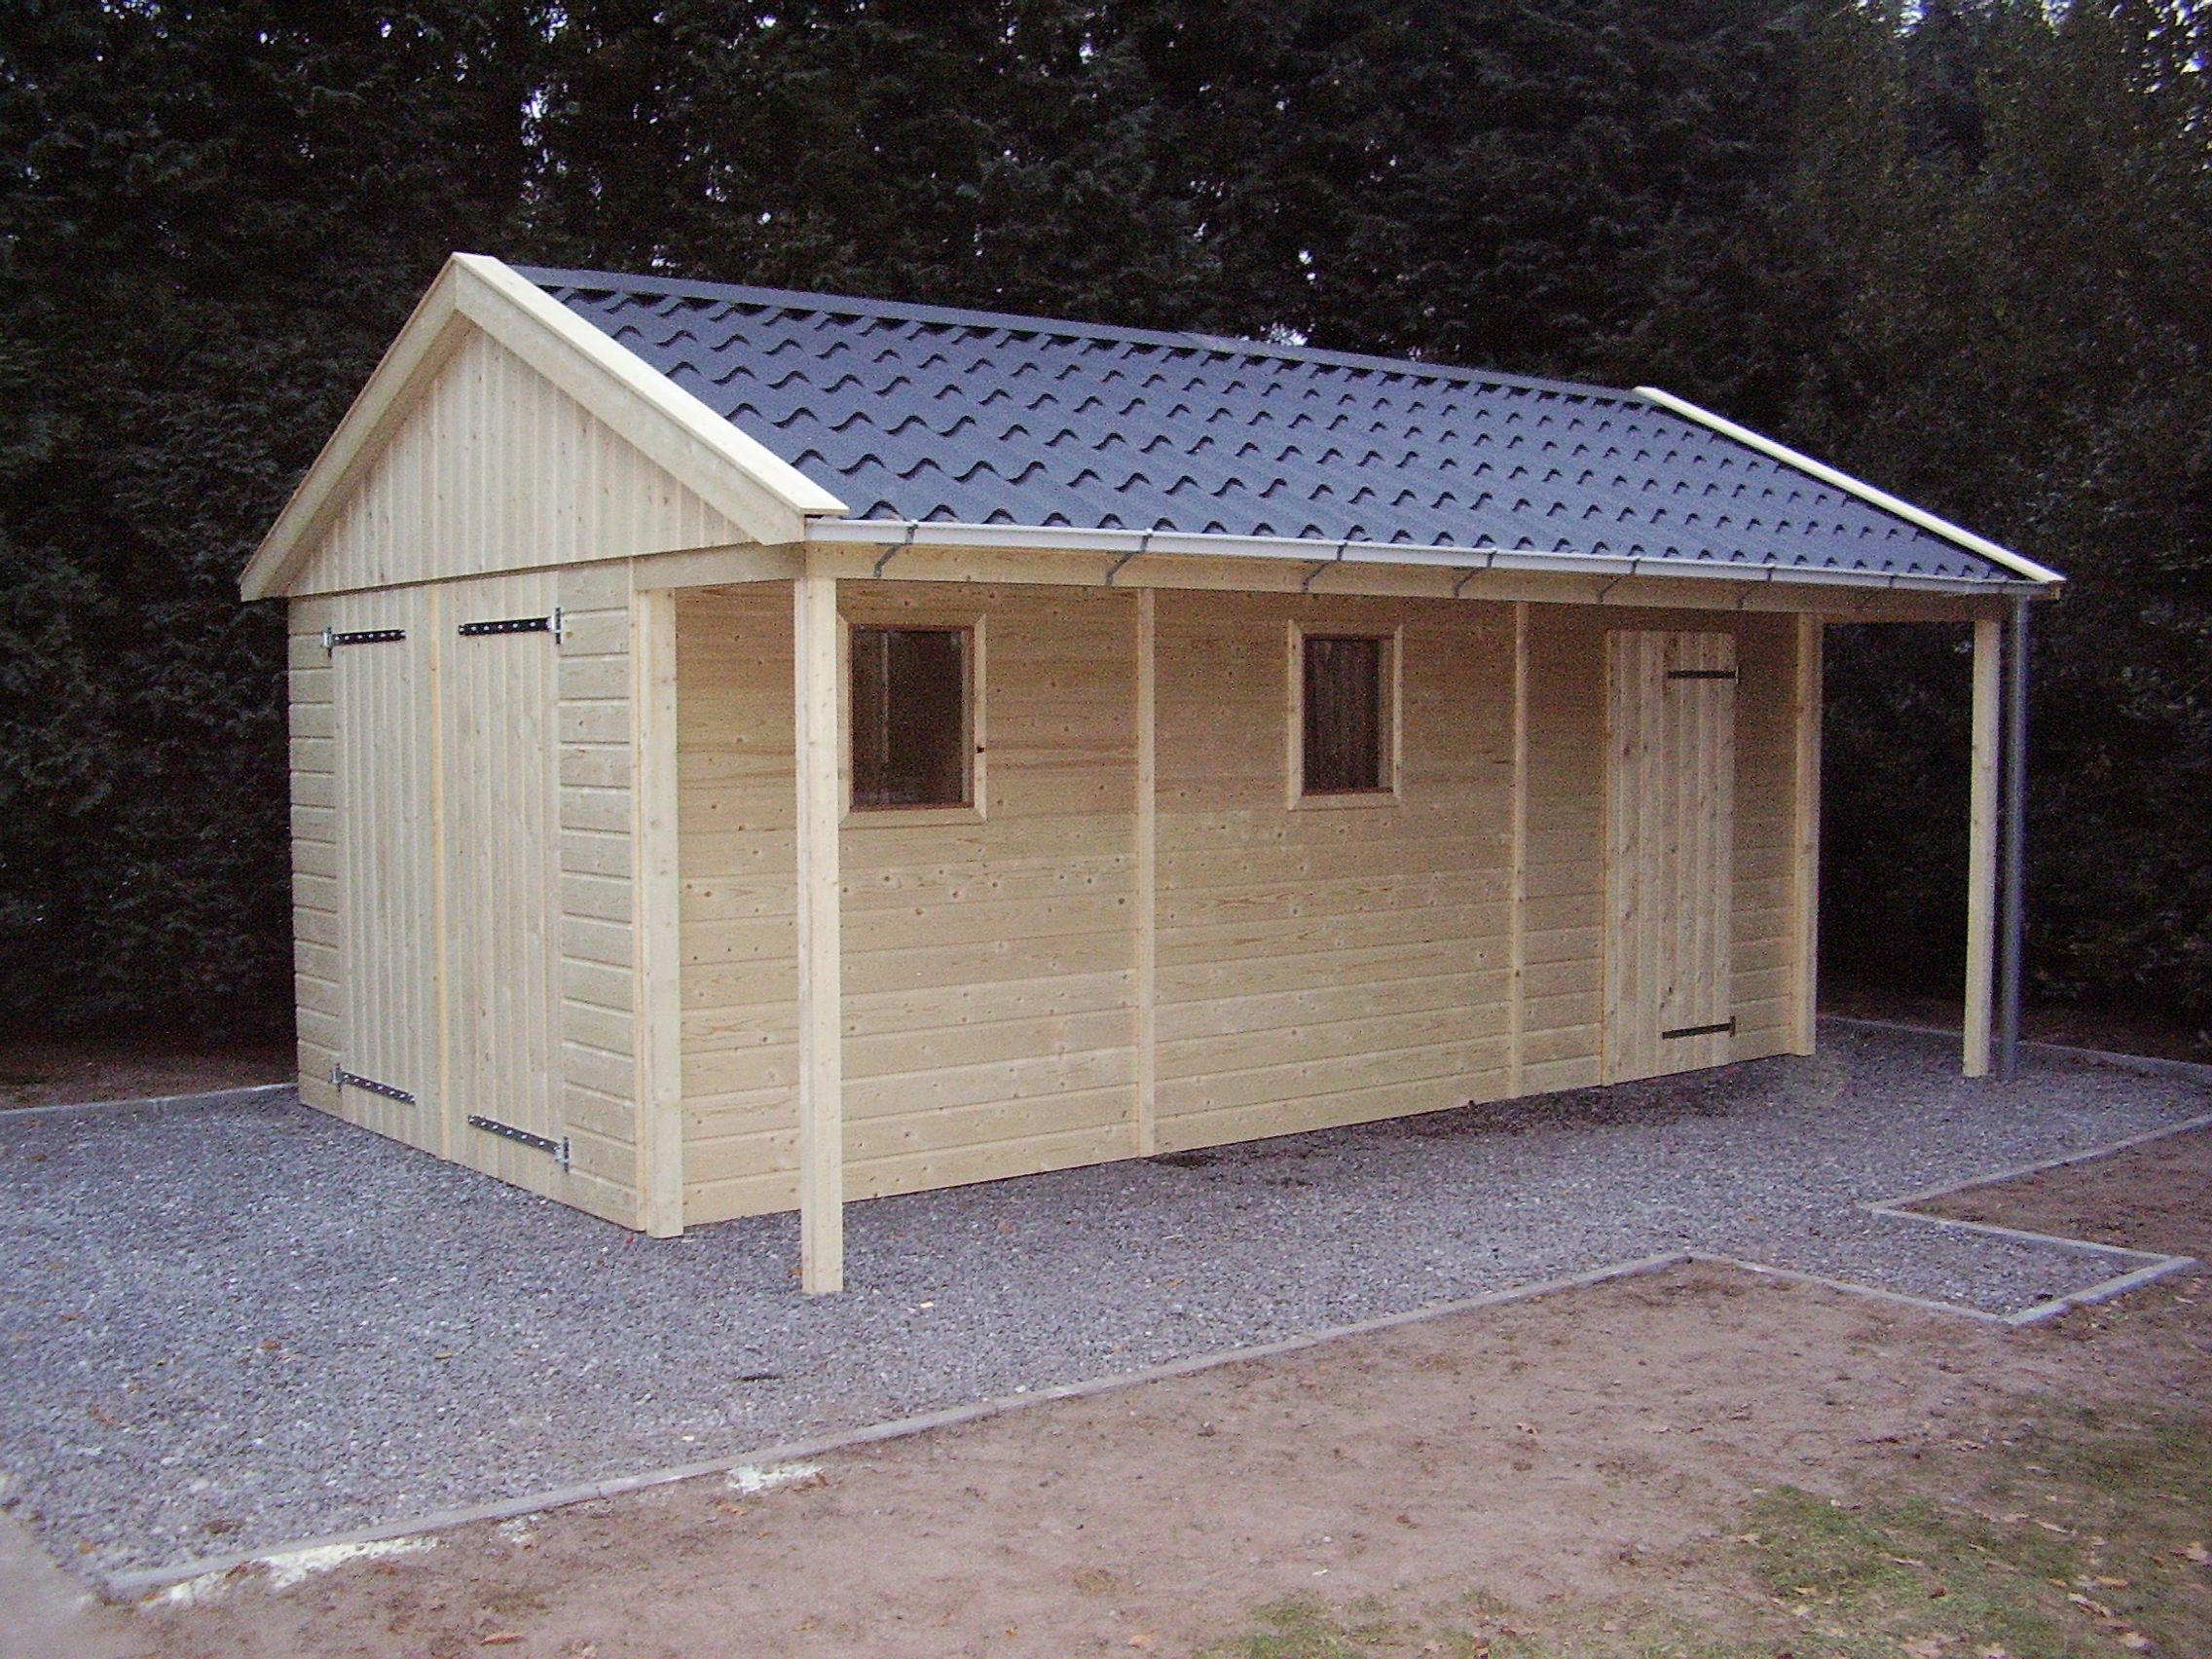 Houtbouw Garage Schuur : Houten garage goedkopeschuur.nl